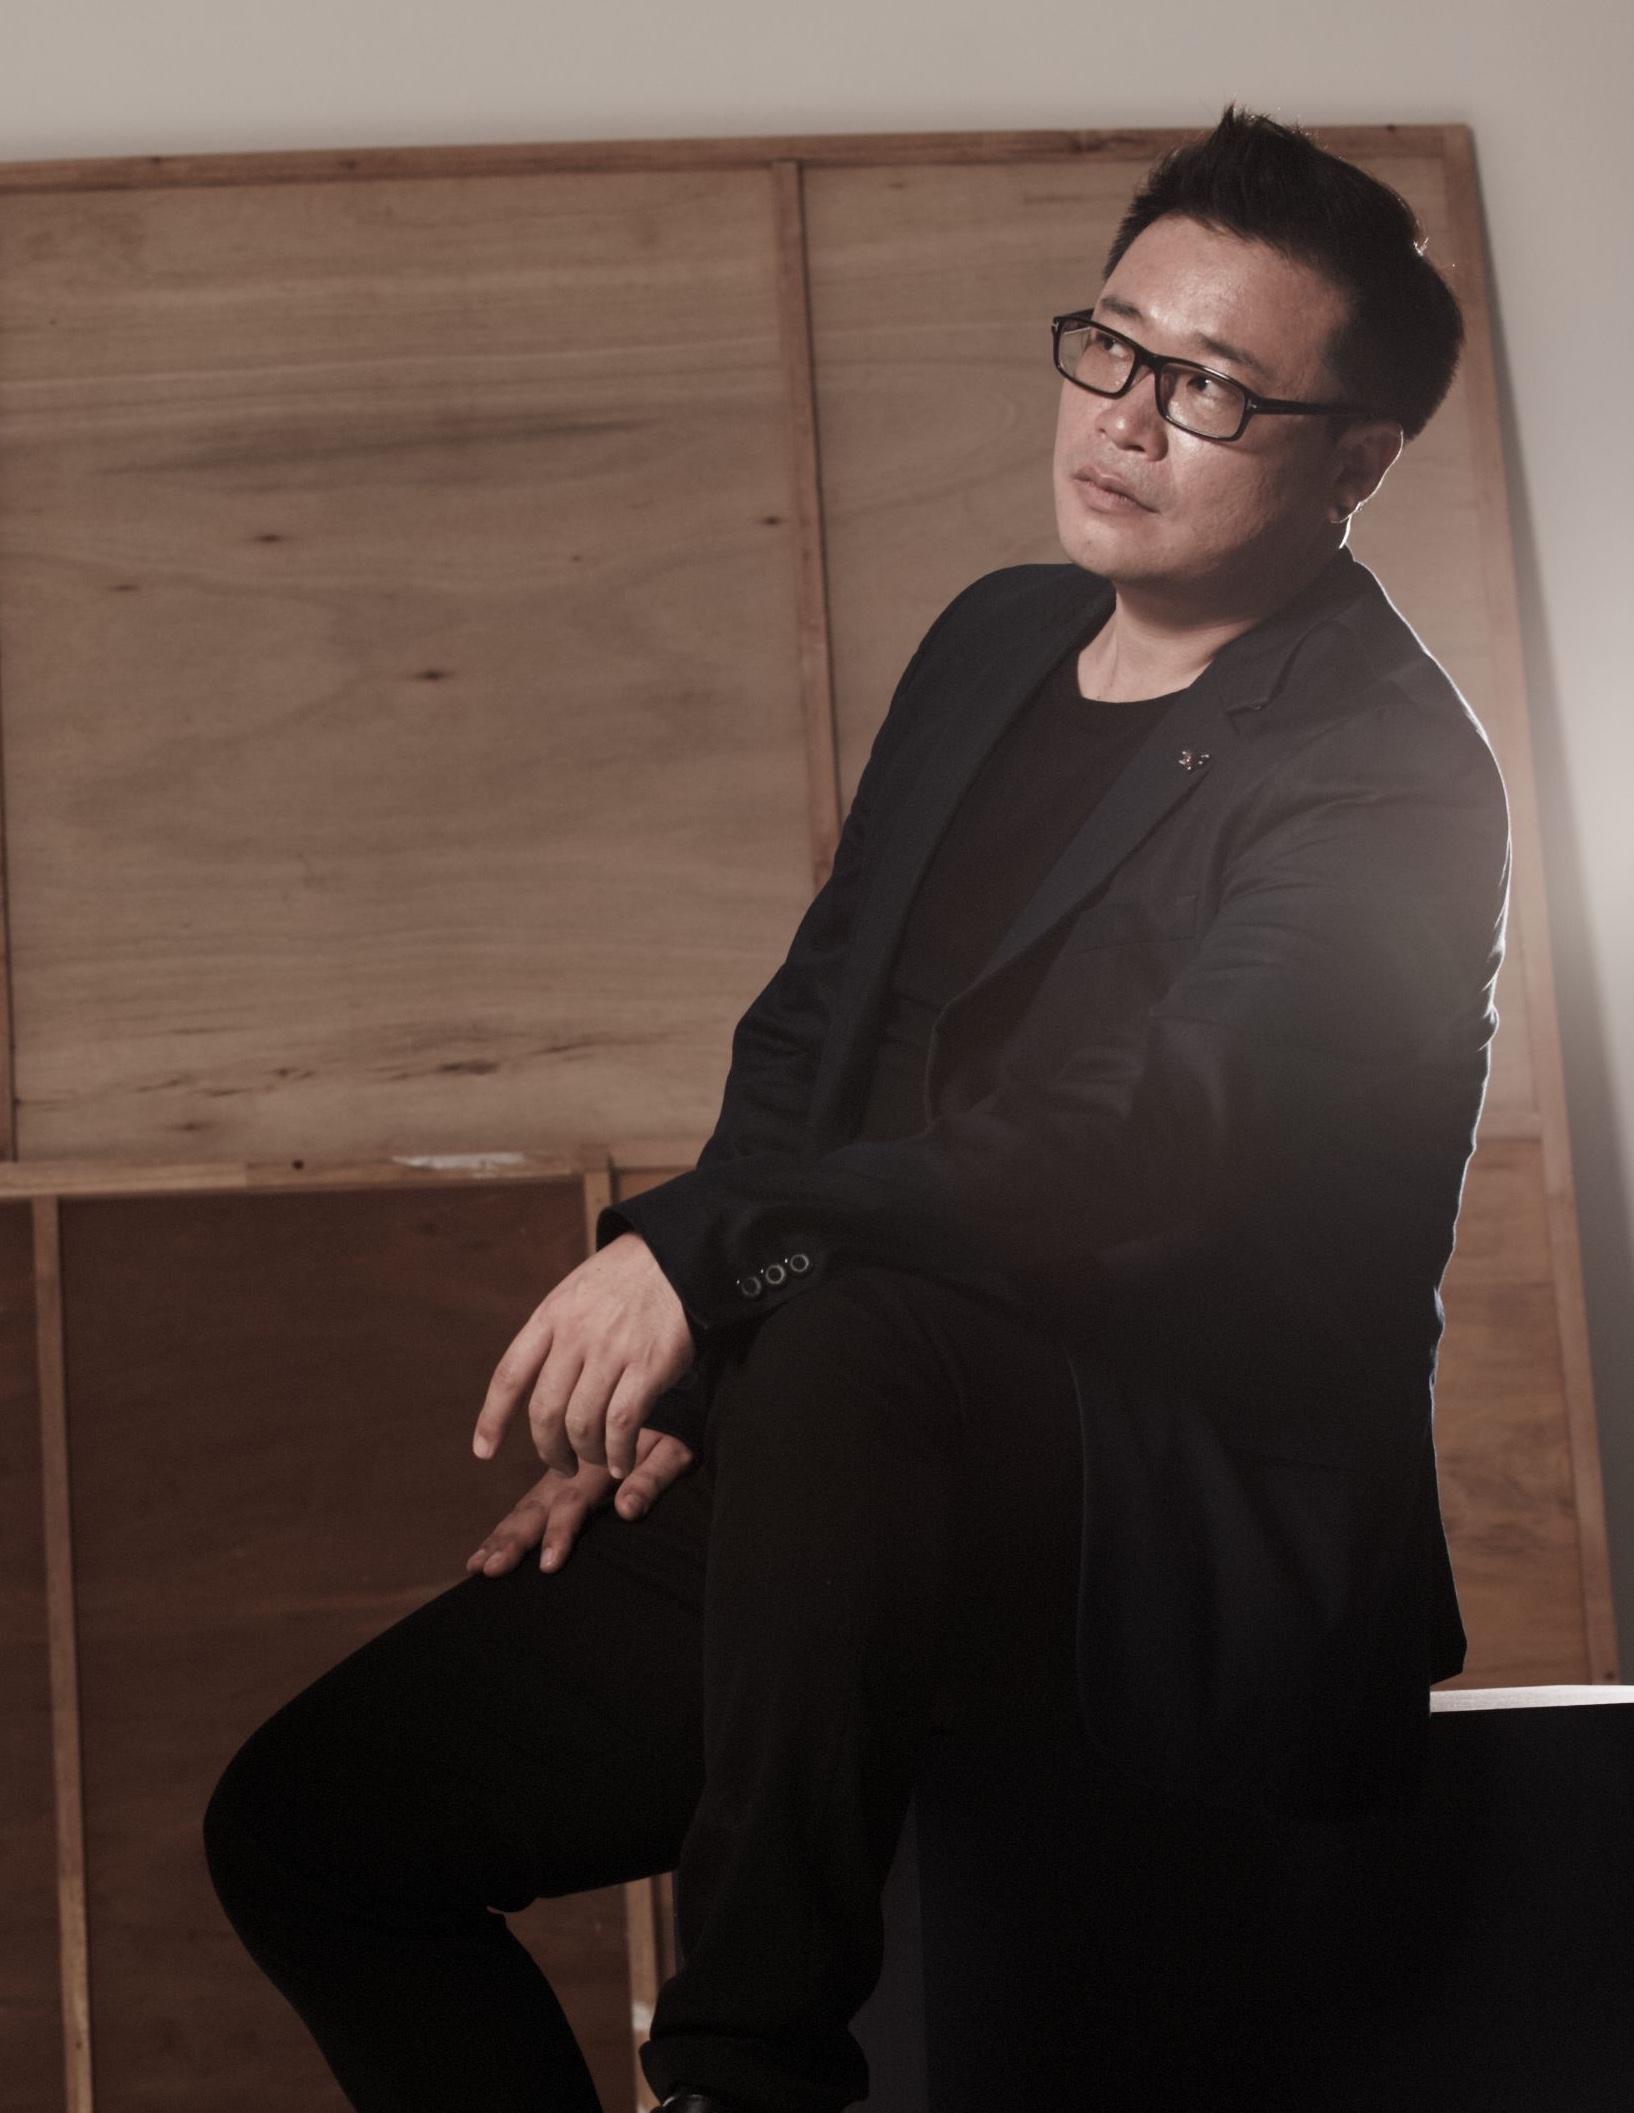 Lee Jung-Sub